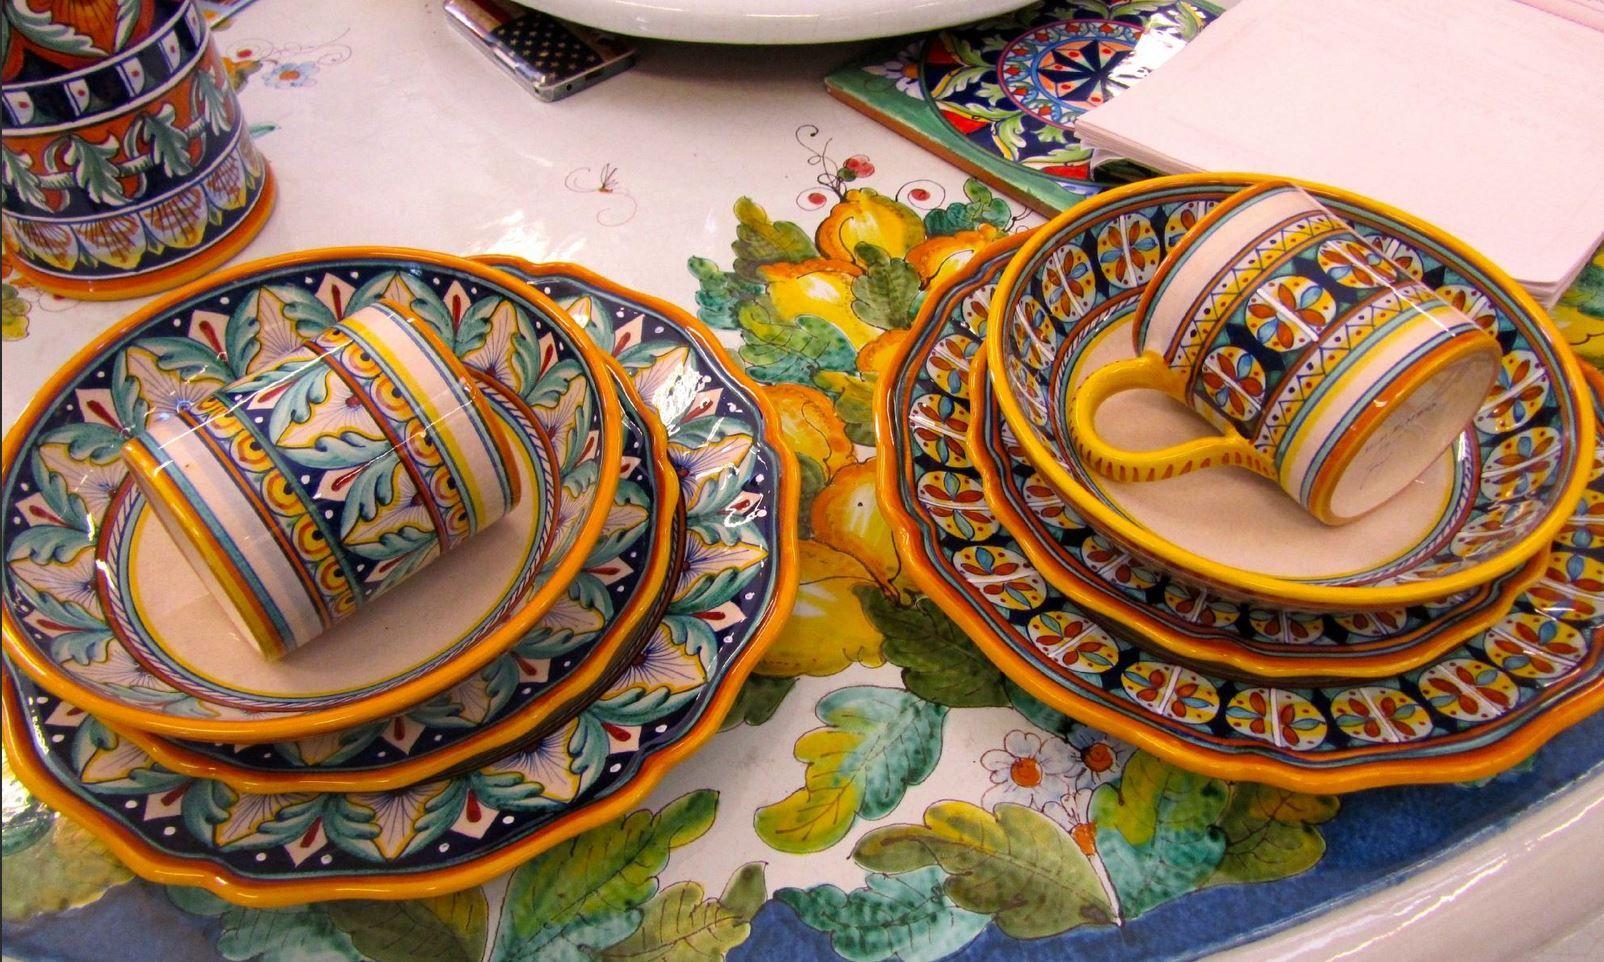 Pascal Ravello Ceramics Plates | The beautiful patterns on my dinnerware! & Pascal Ravello Ceramics Plates | The beautiful patterns on my ...